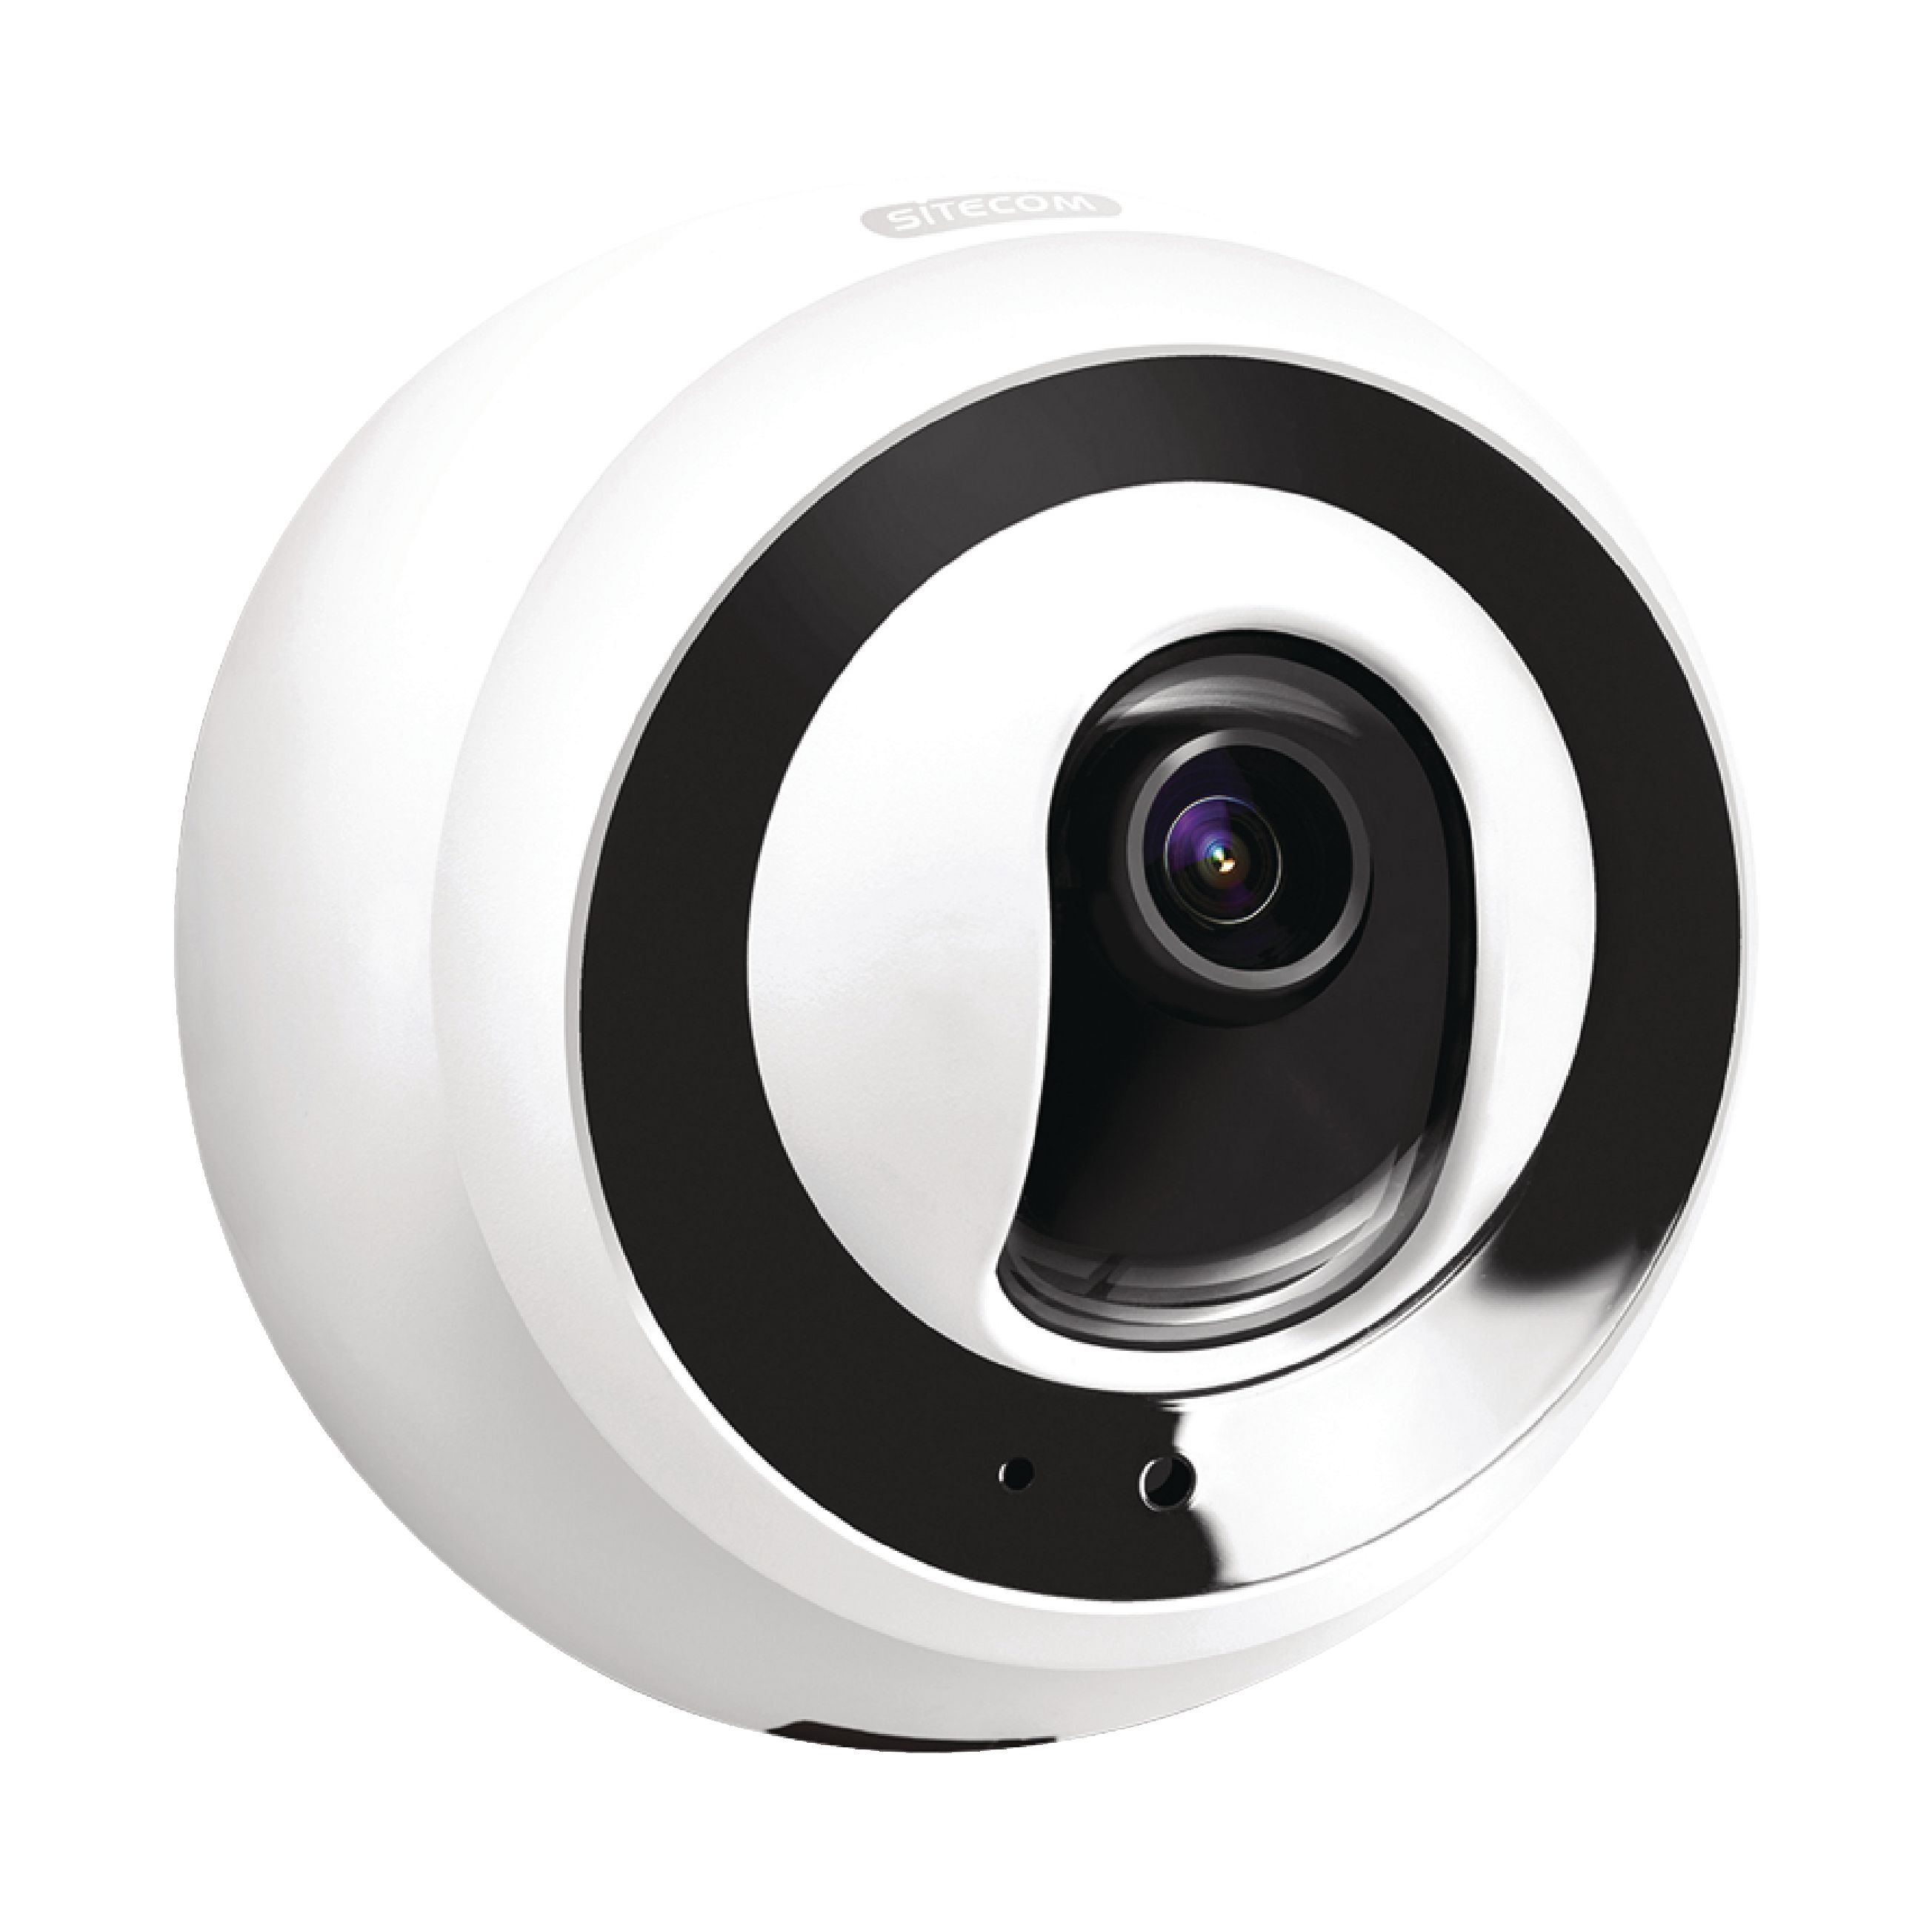 WLC-3000 - Sitecom - HD Caméra de surveillance IP Pan-Tilt Intérieur ...